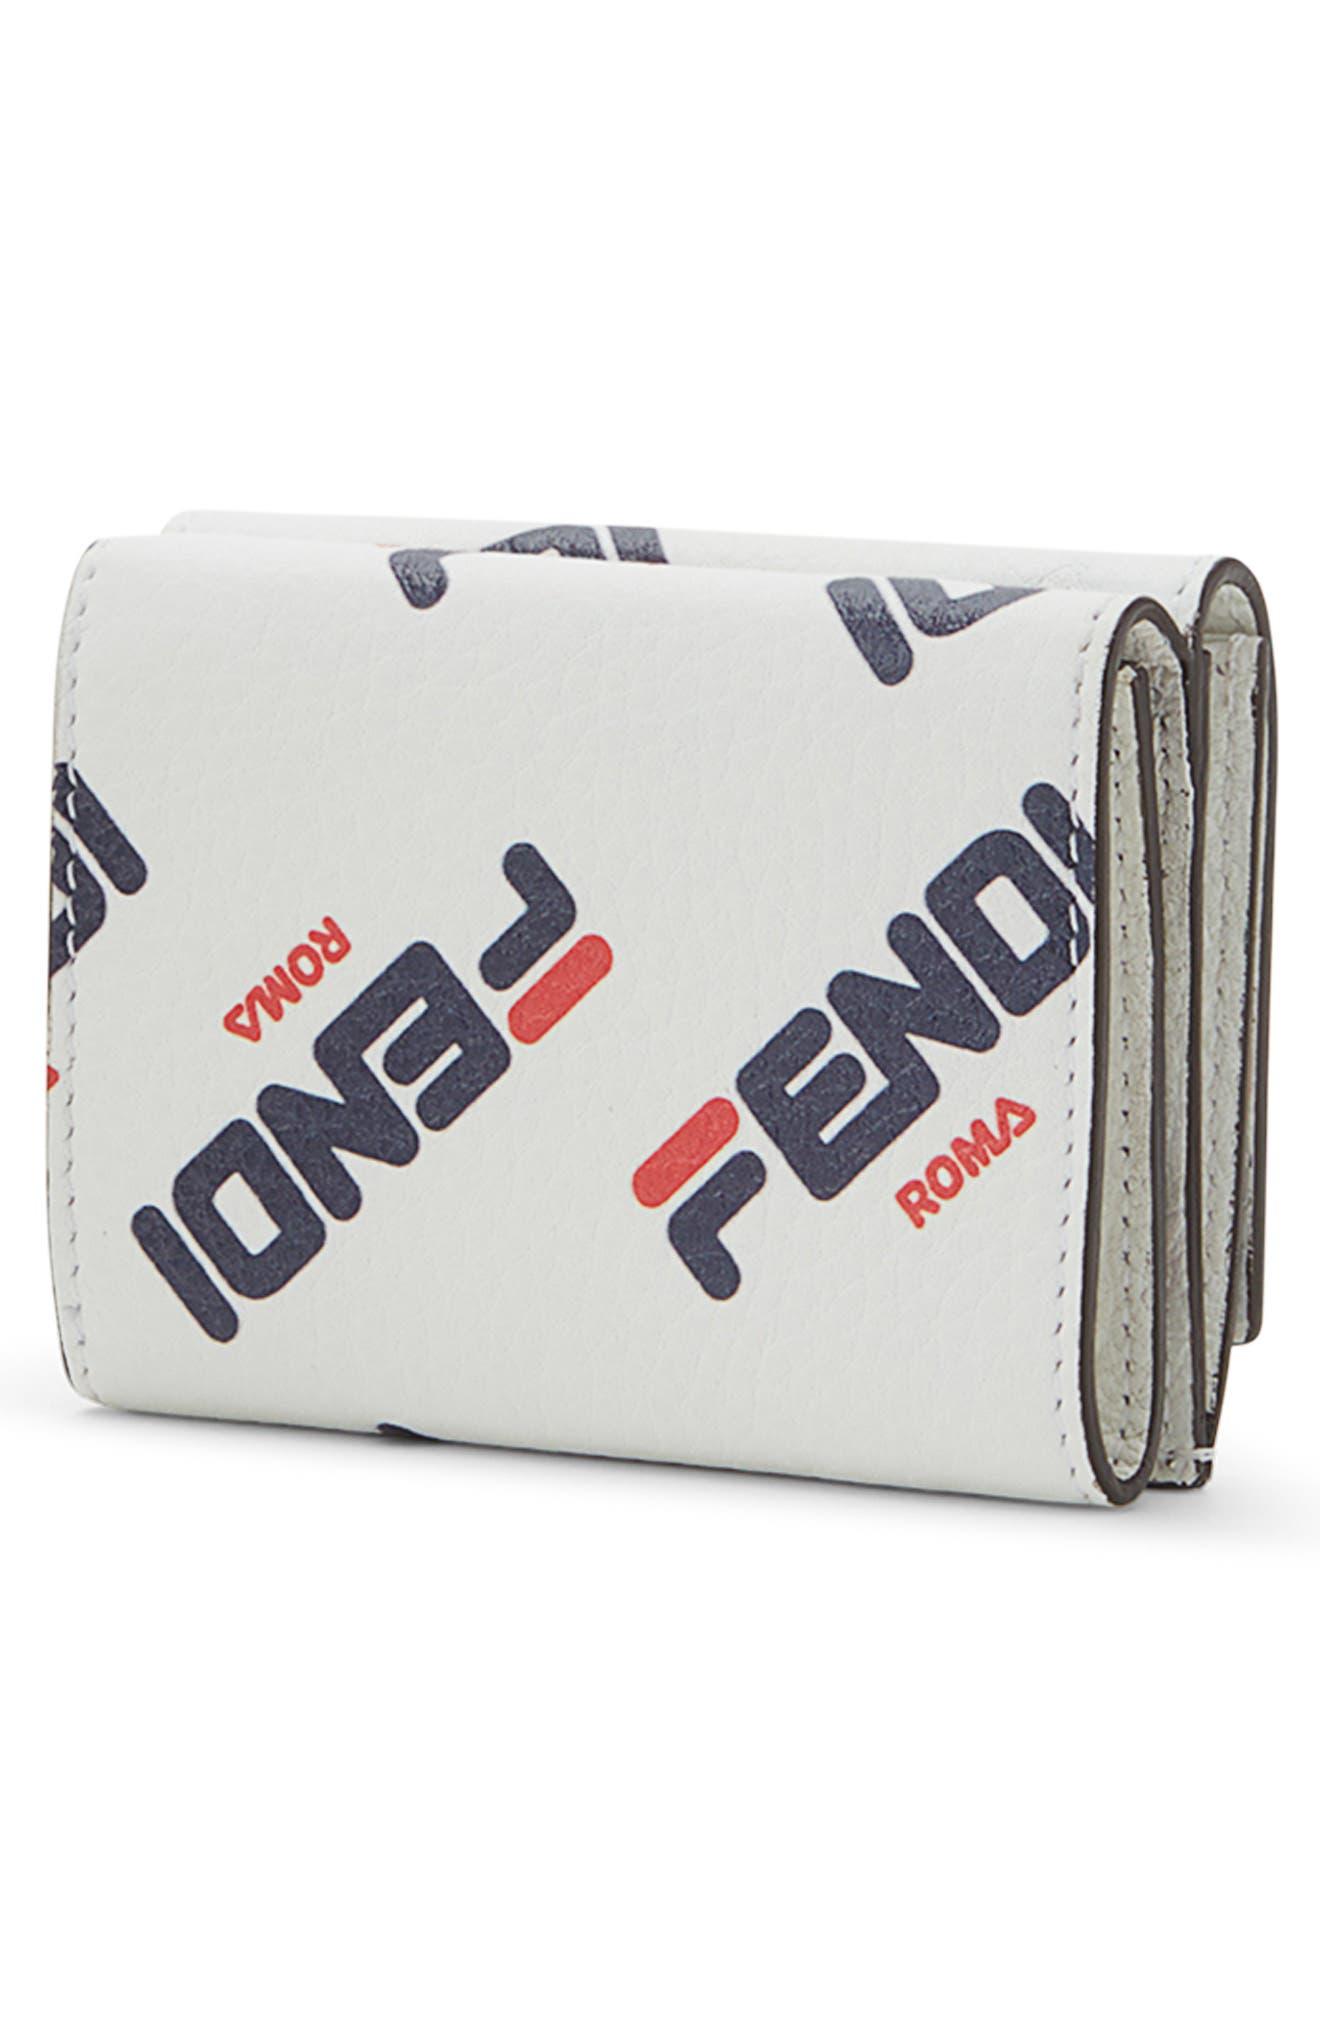 x FILA Mania Logo Trifold Wallet,                             Alternate thumbnail 3, color,                             BIANCO/ ORO SOFT